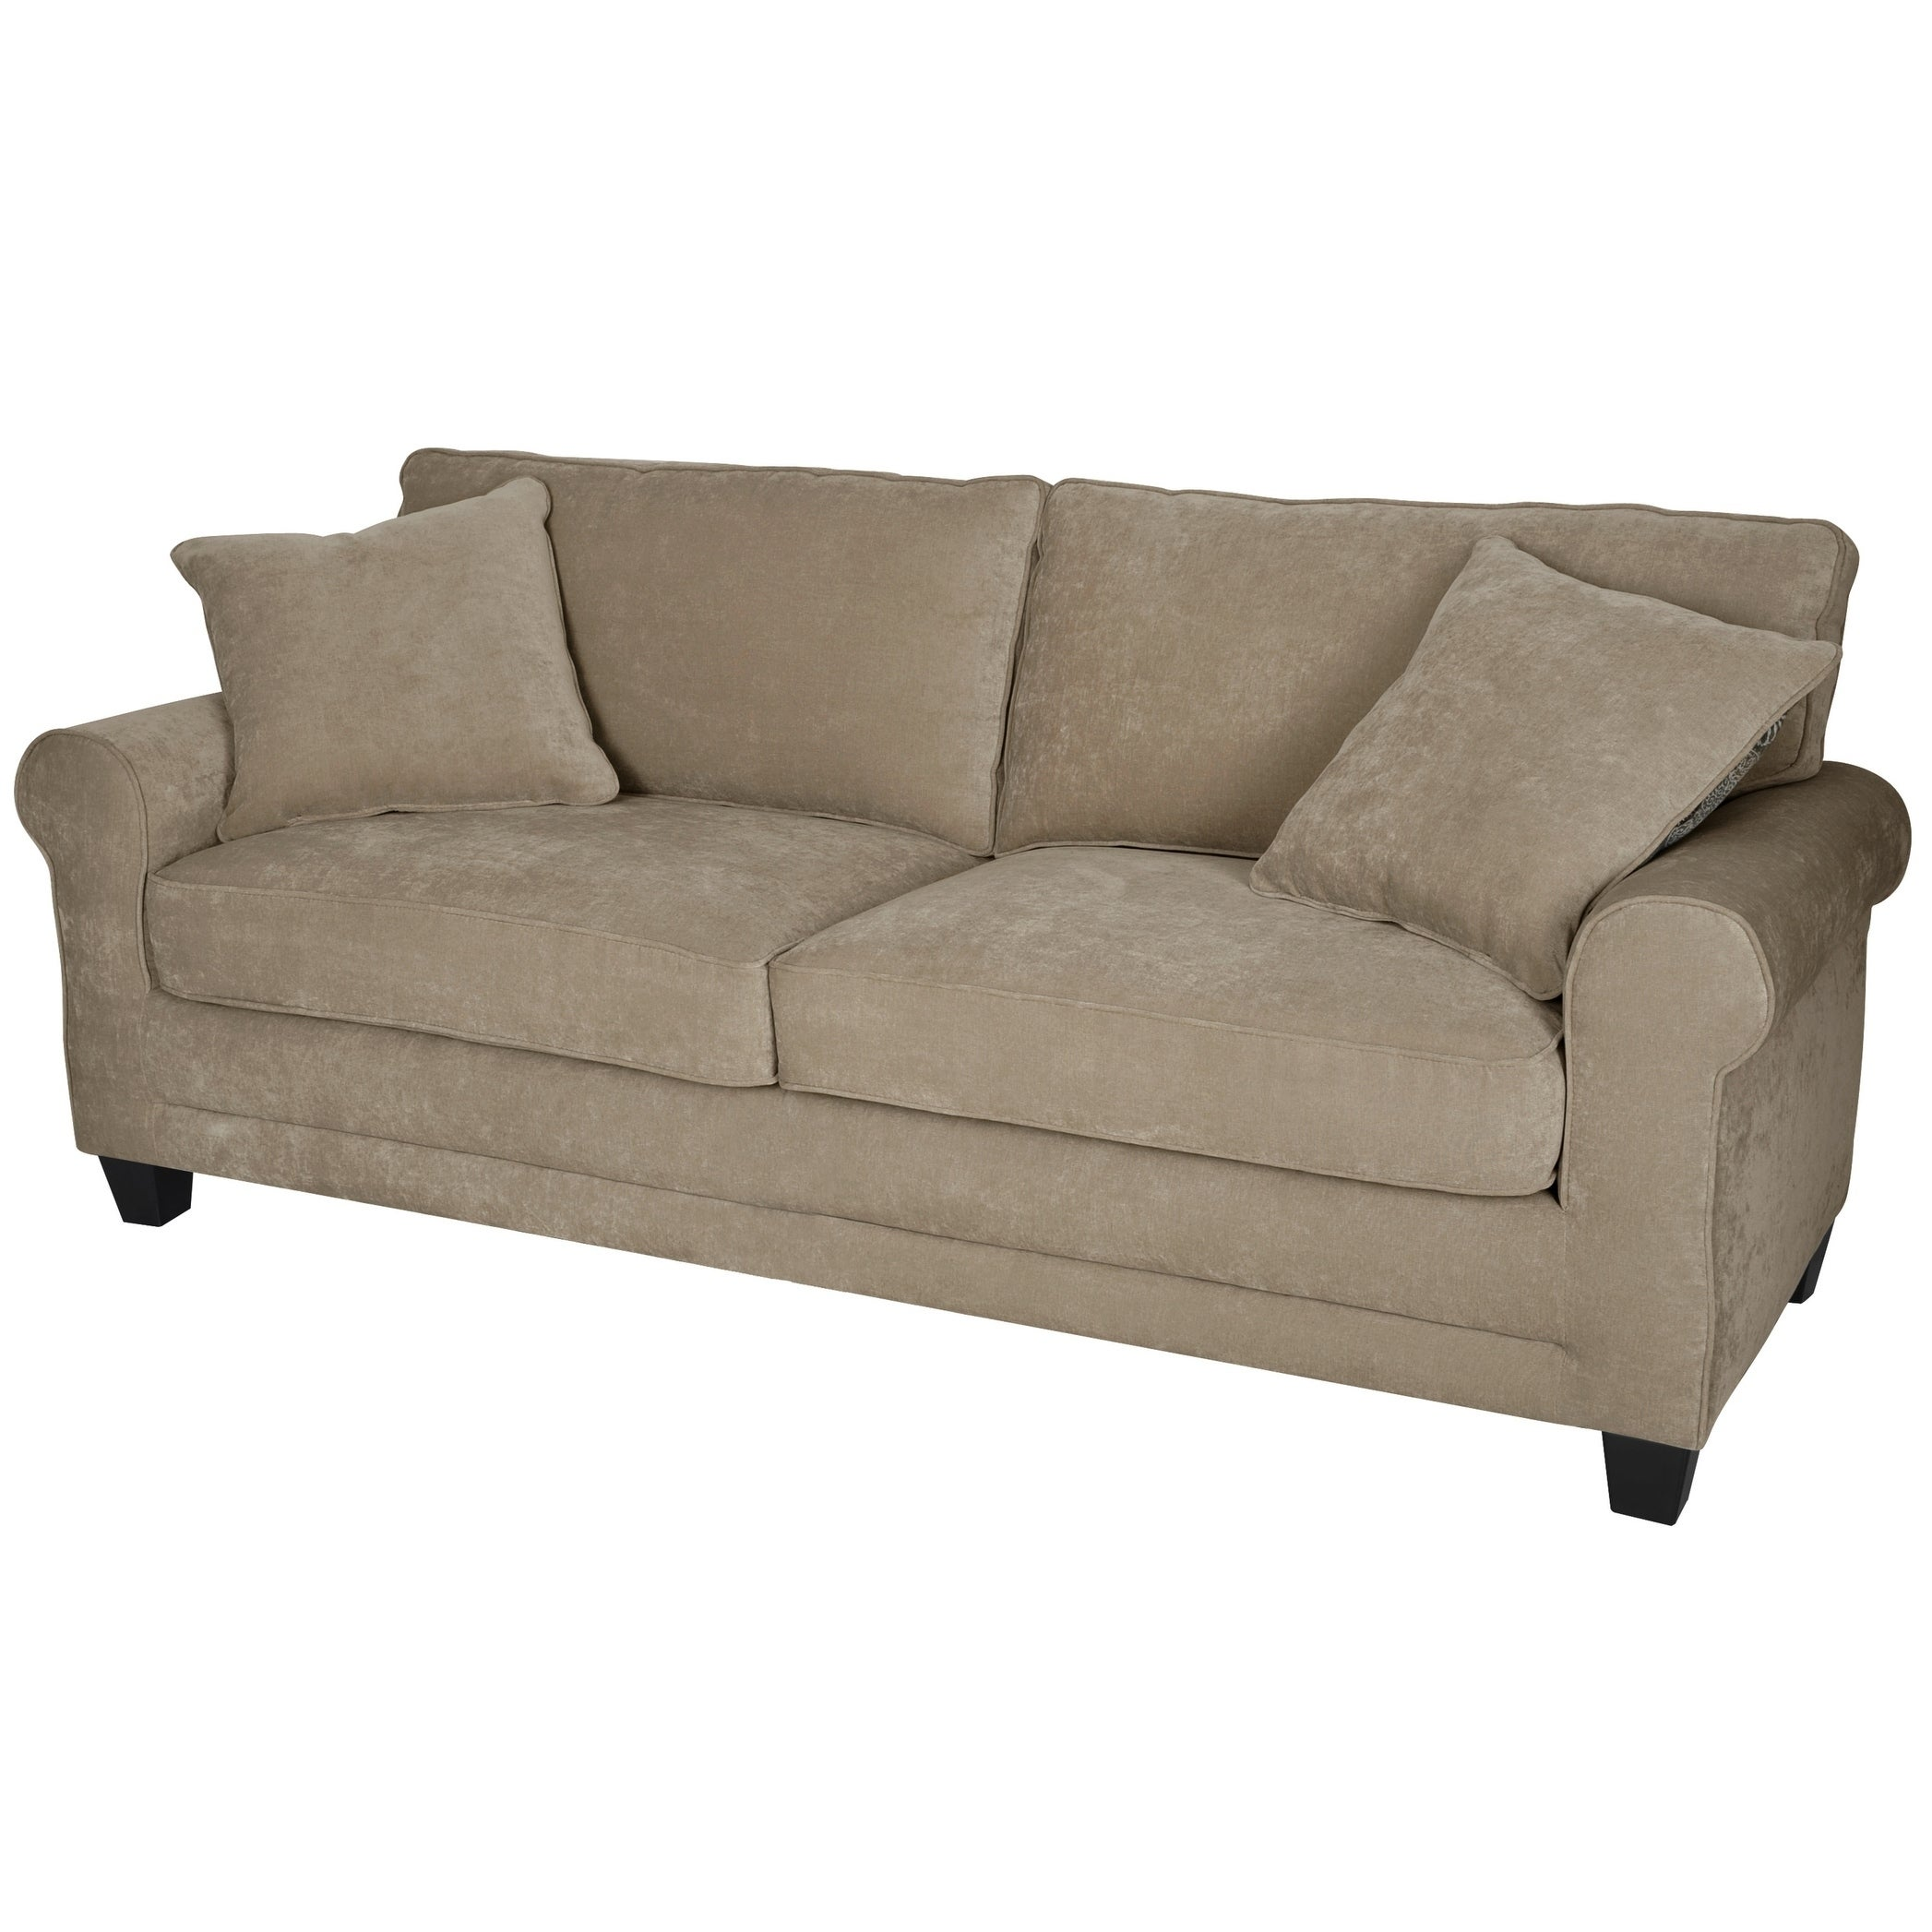 Whitney Tan 73-inch Sofa